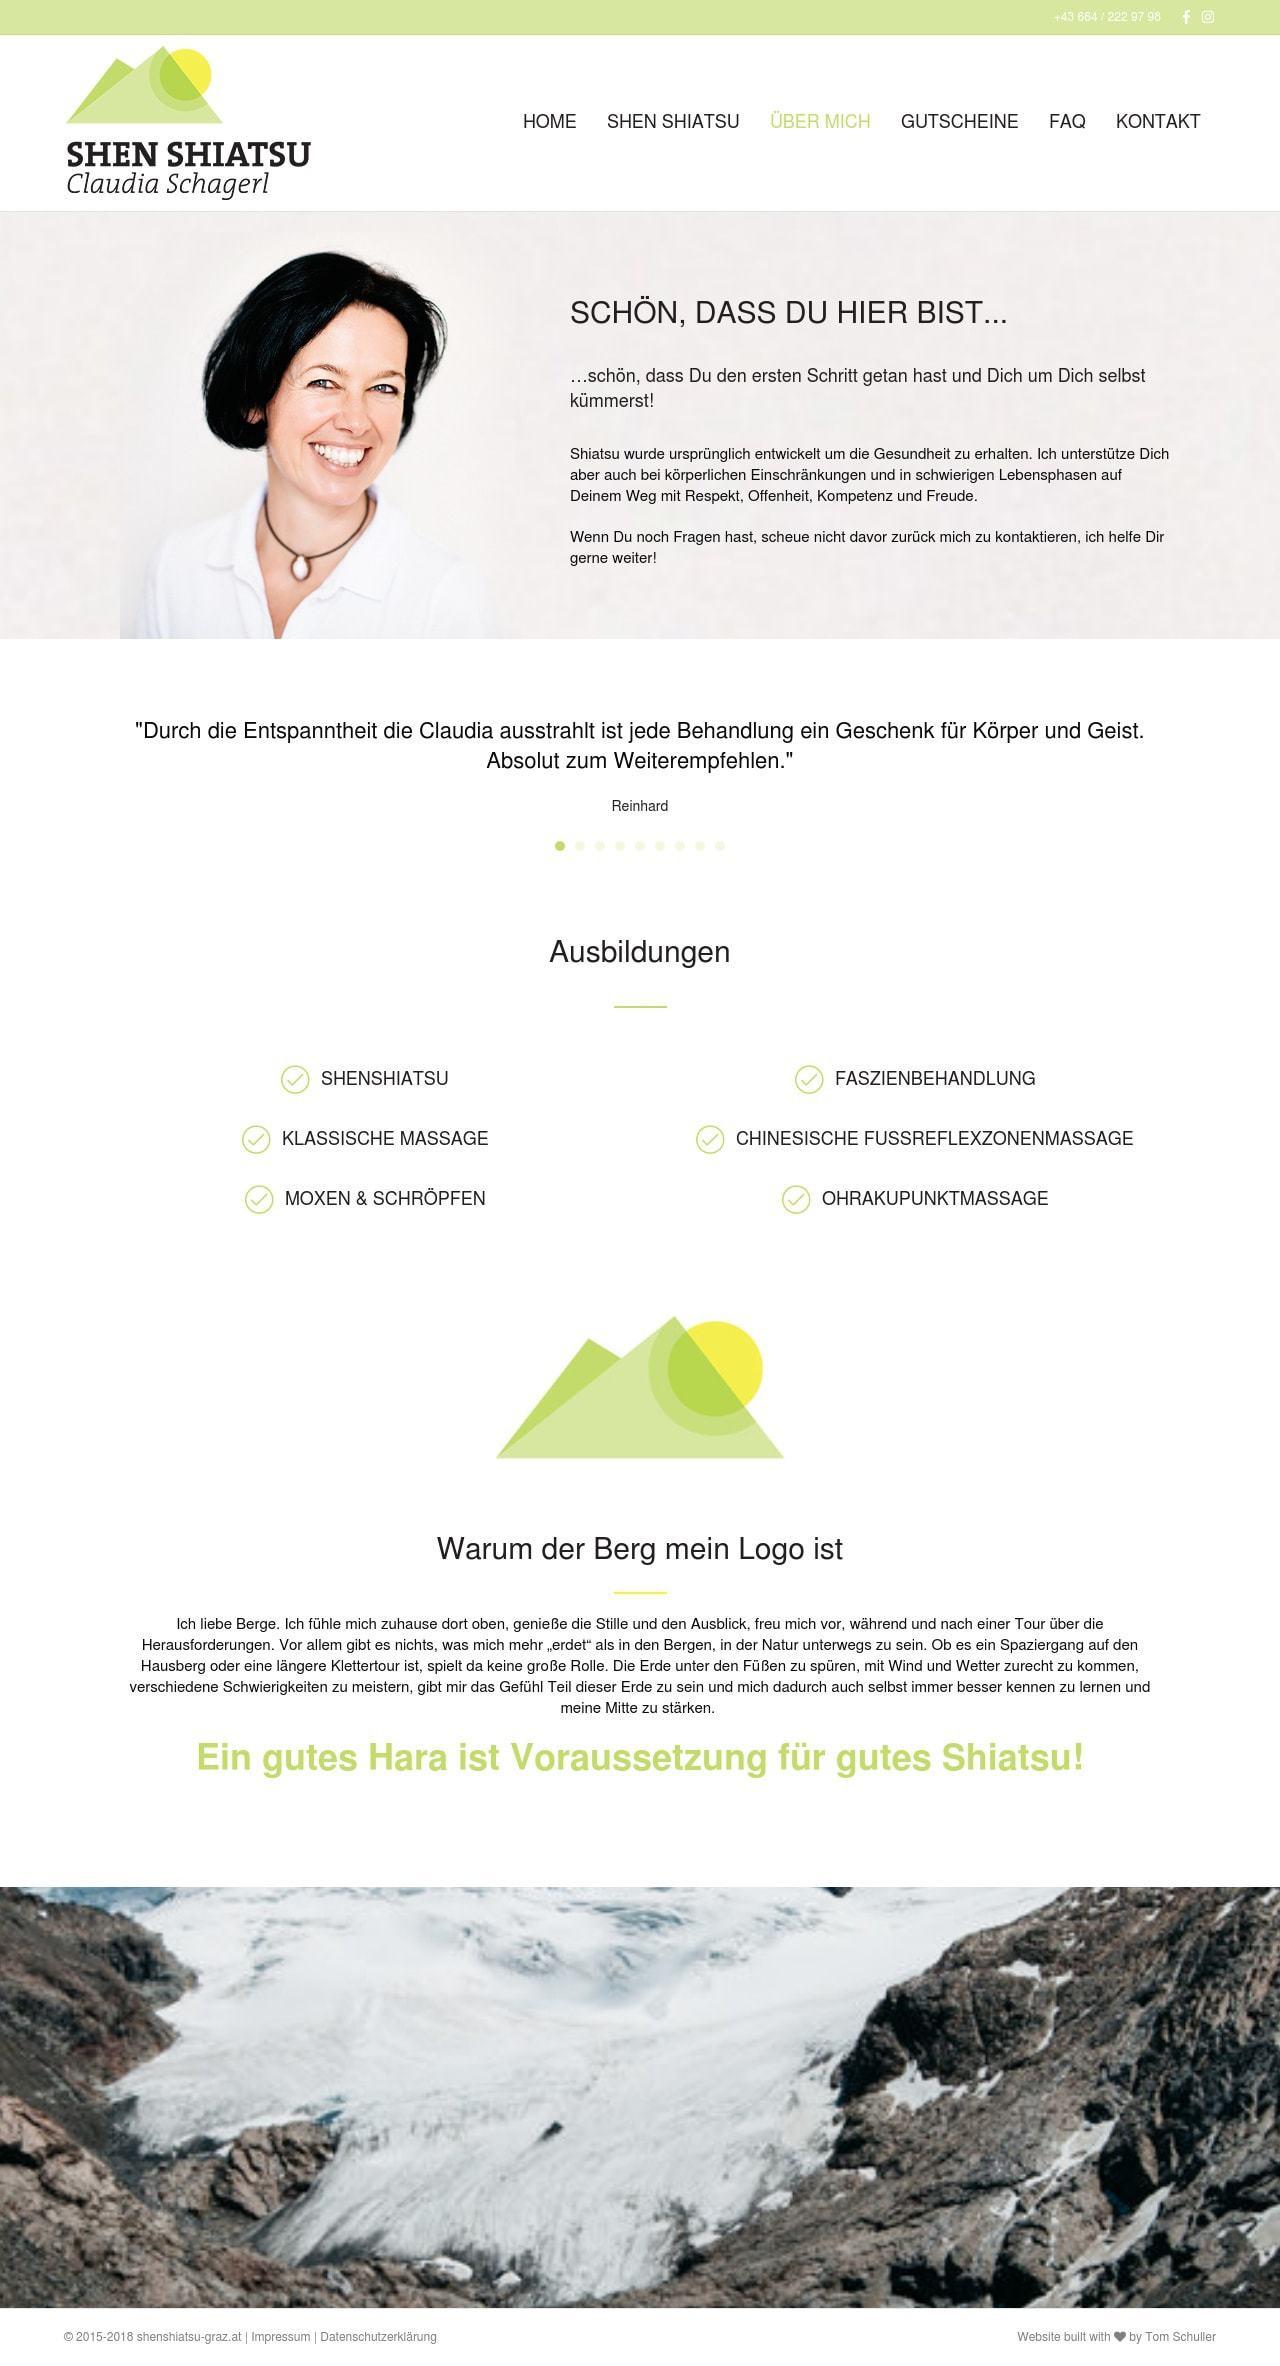 Shenshiatsu Graz Webdesign Ueber Mich